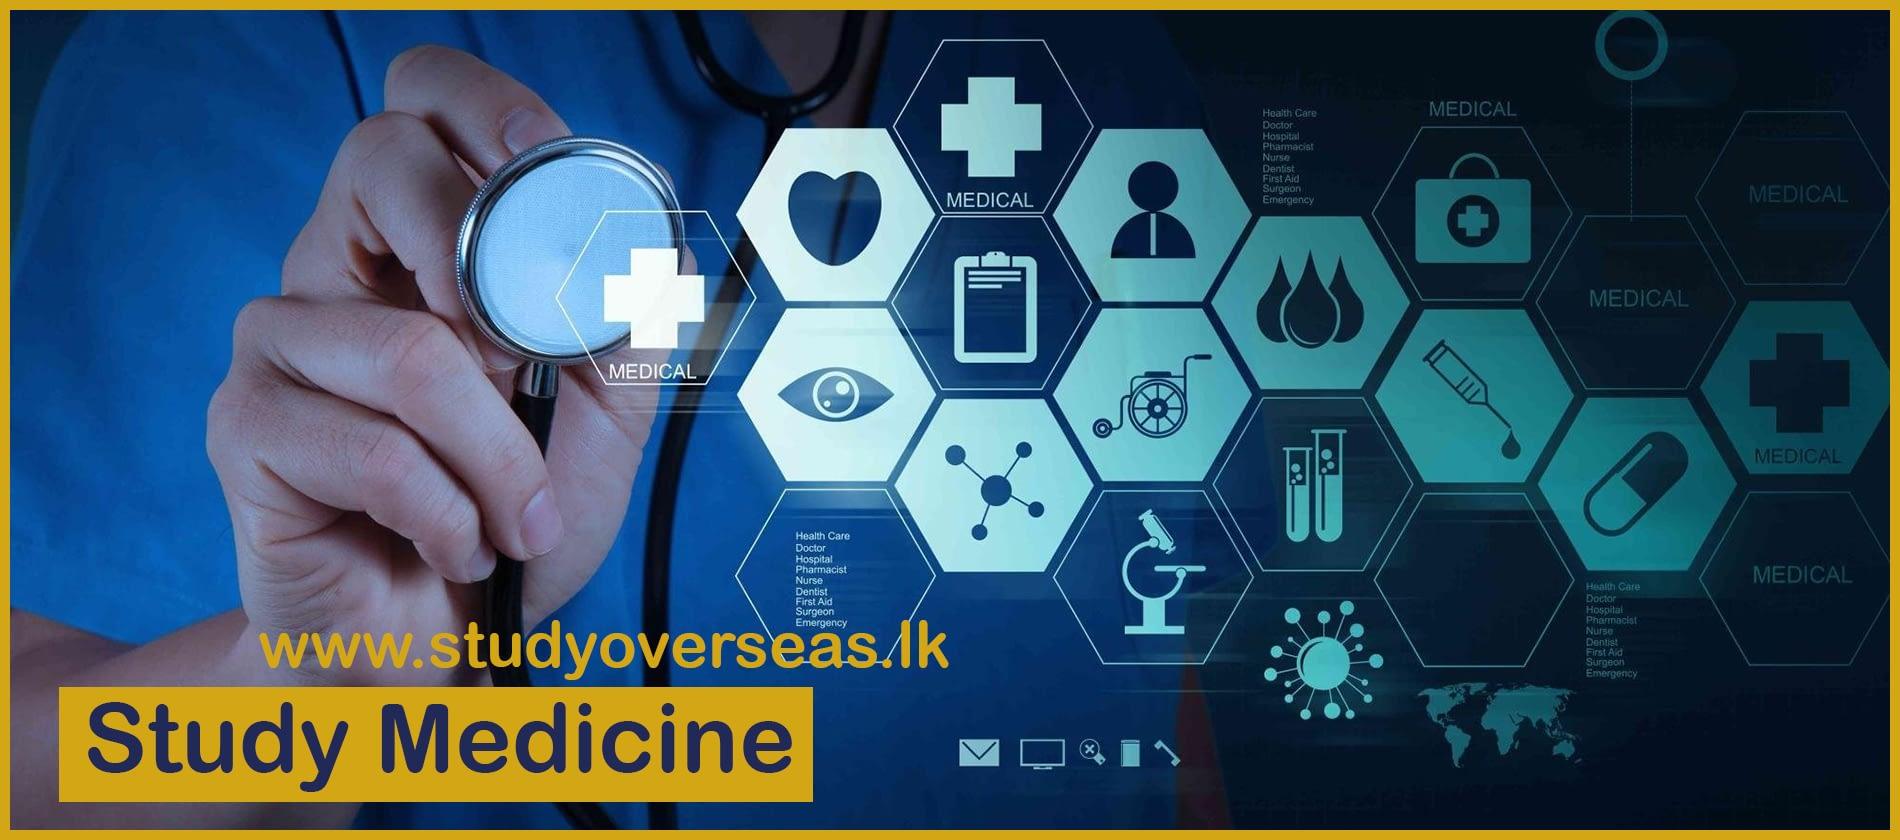 study_medicine_www.studyoverseas.lk